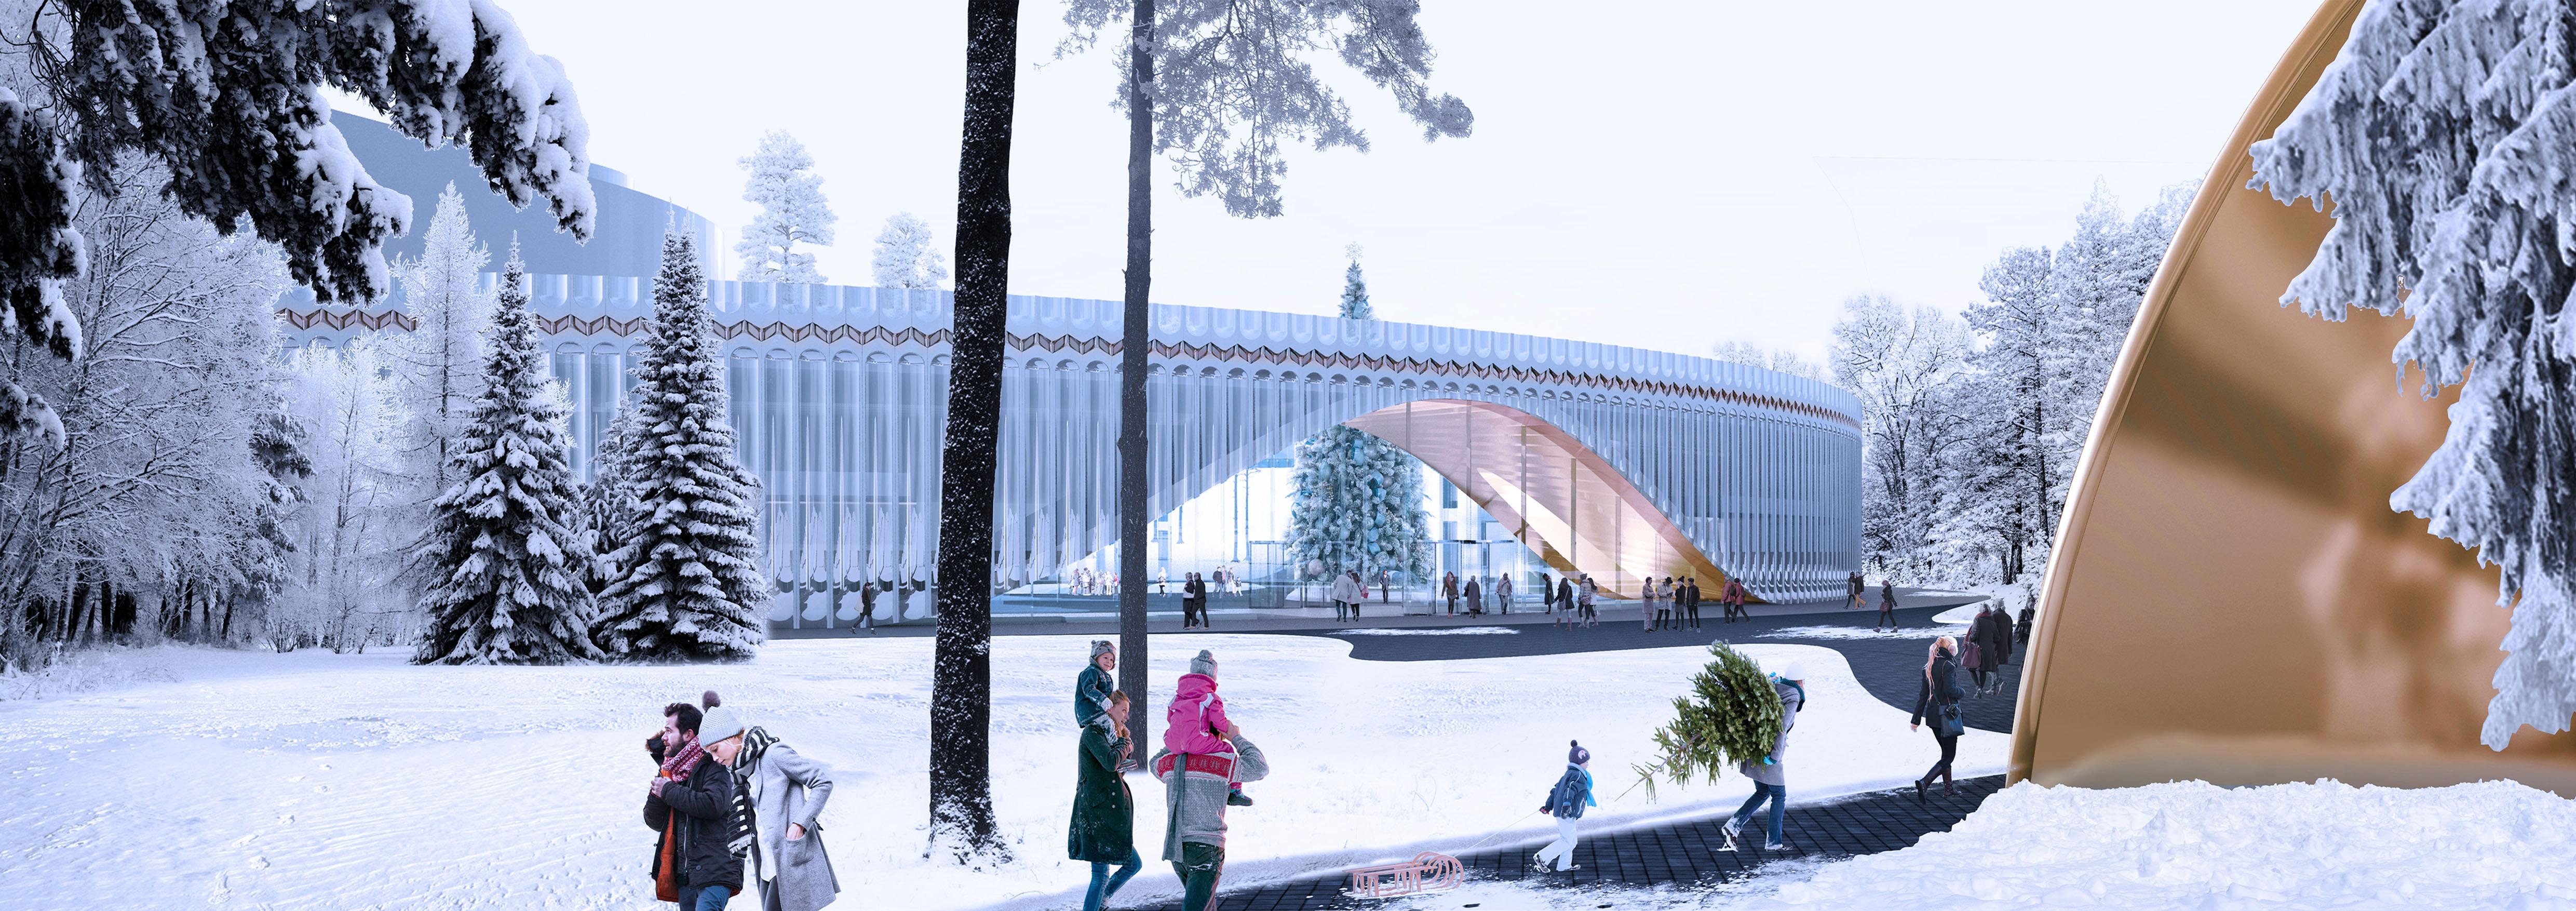 Russian Towns, Cities / Urban Development - Page 6 Chaikovsky_001